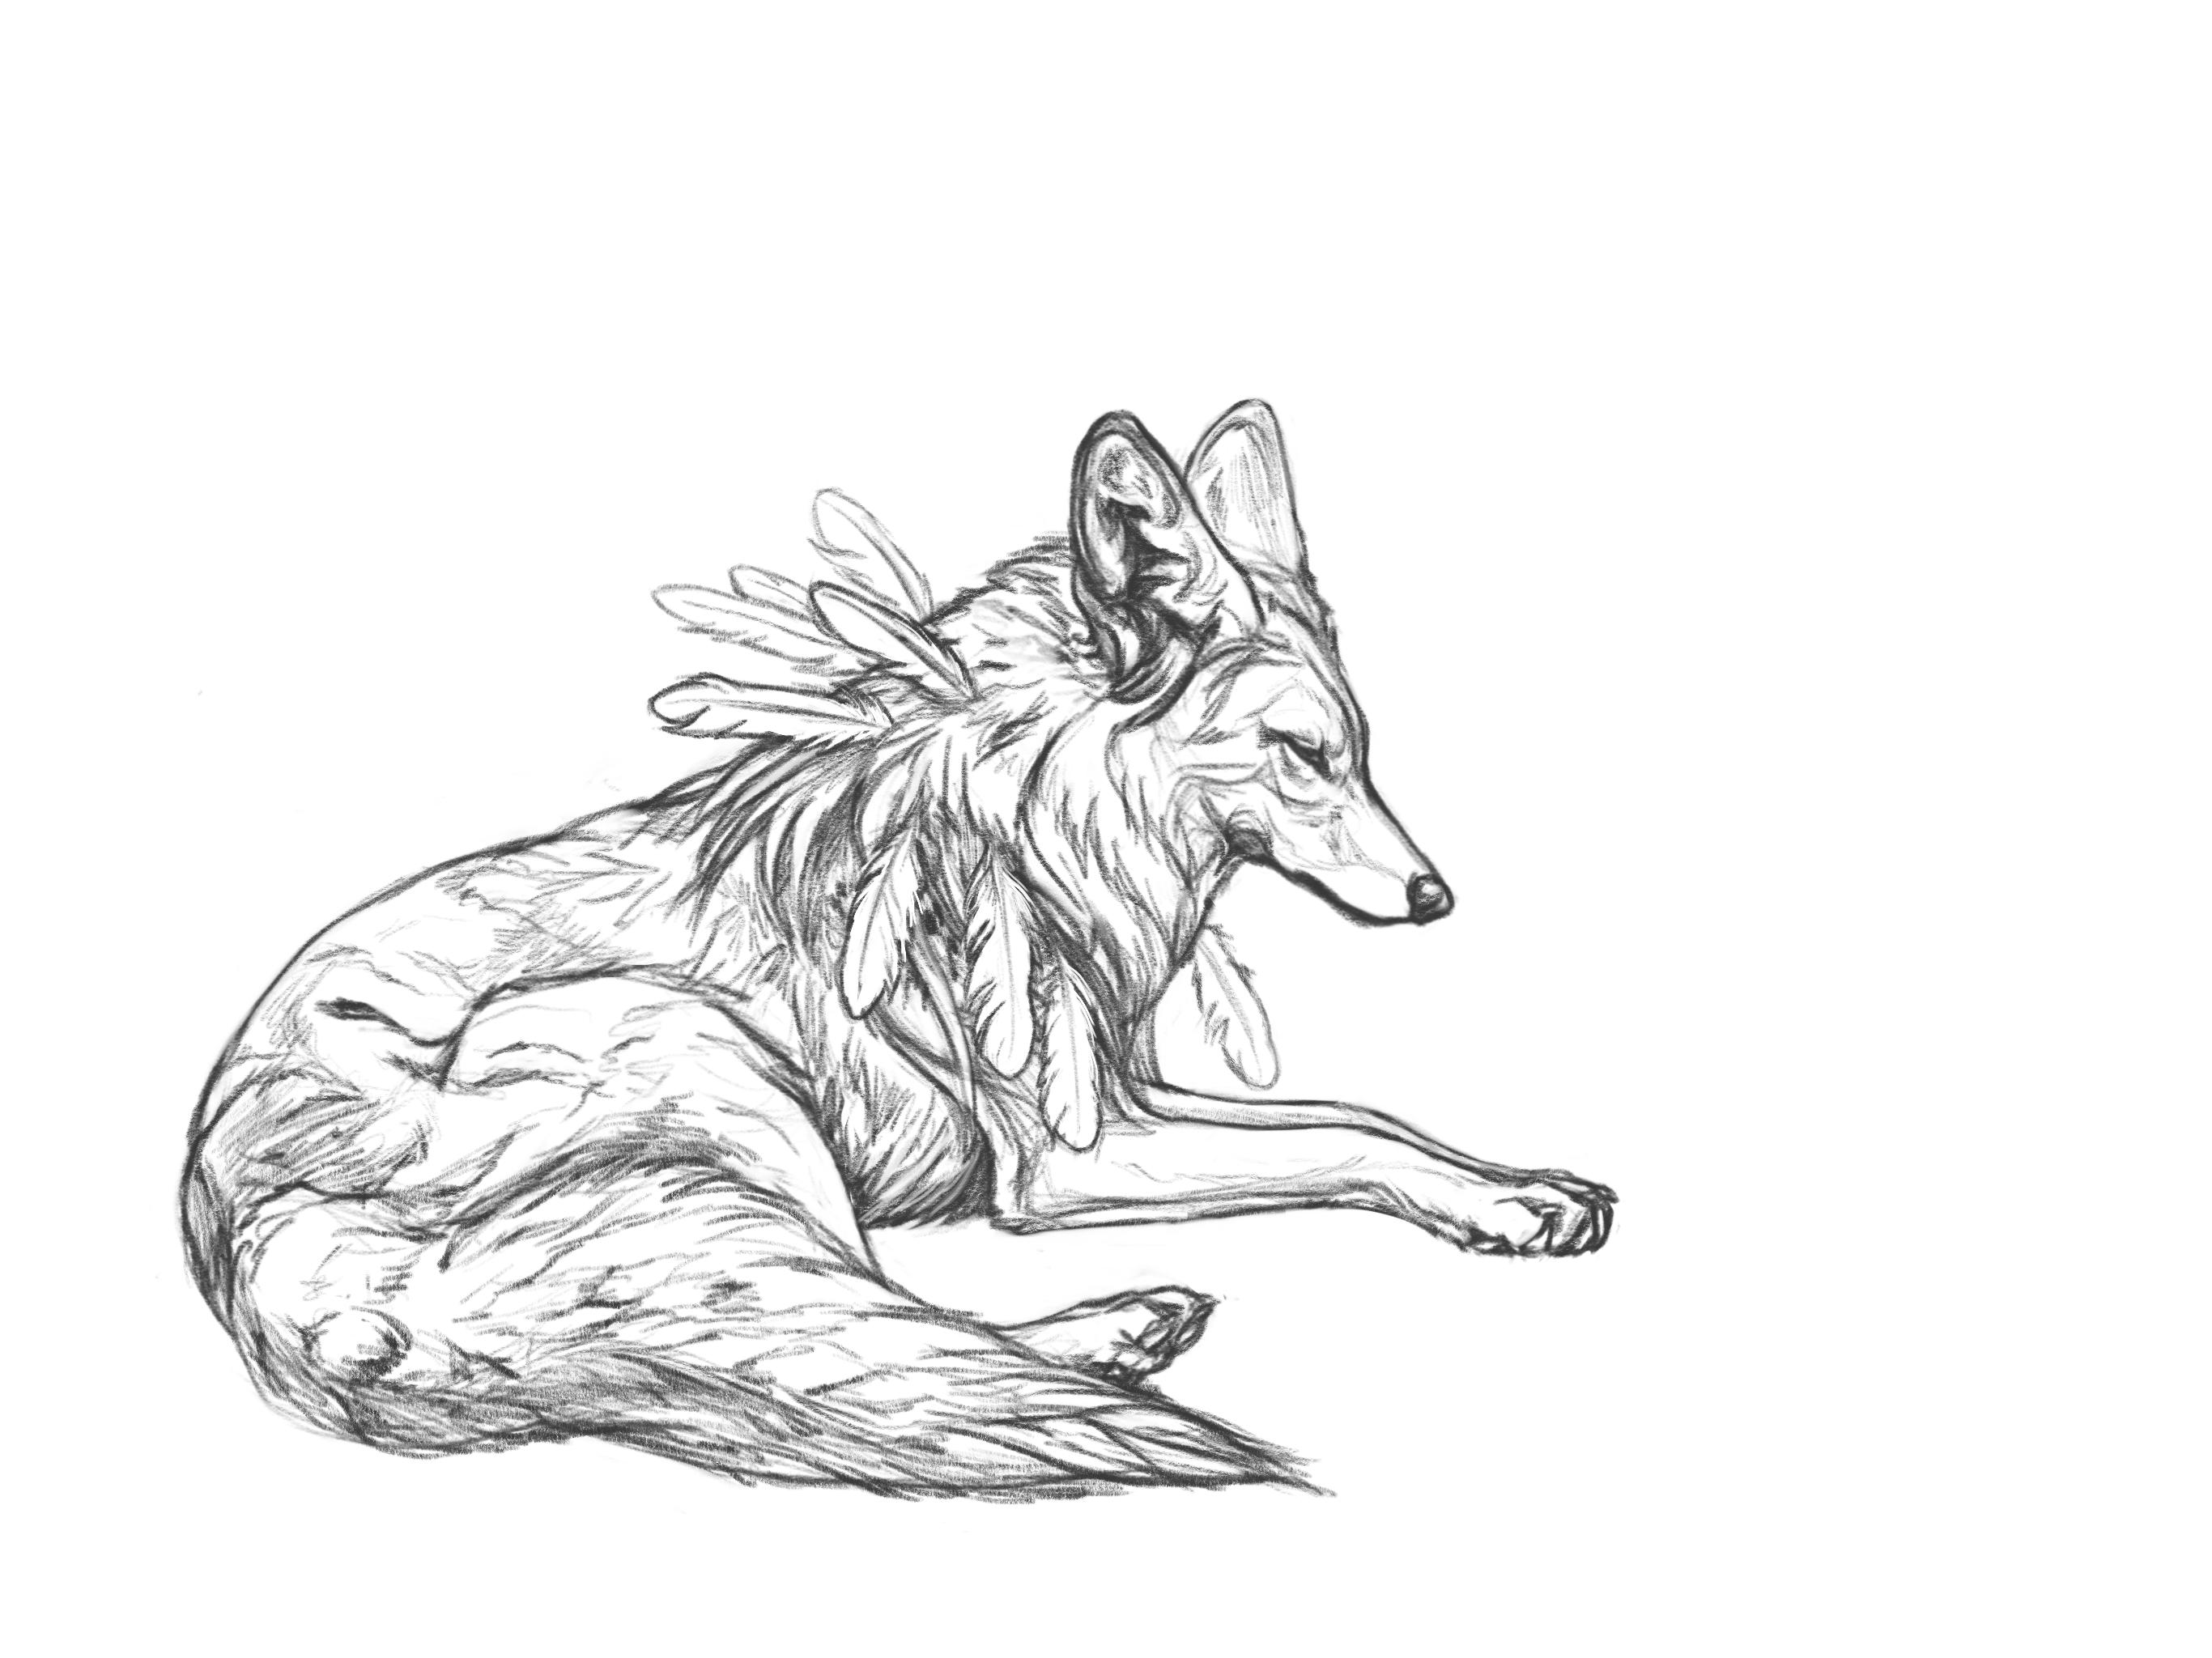 kotori by markedwolf